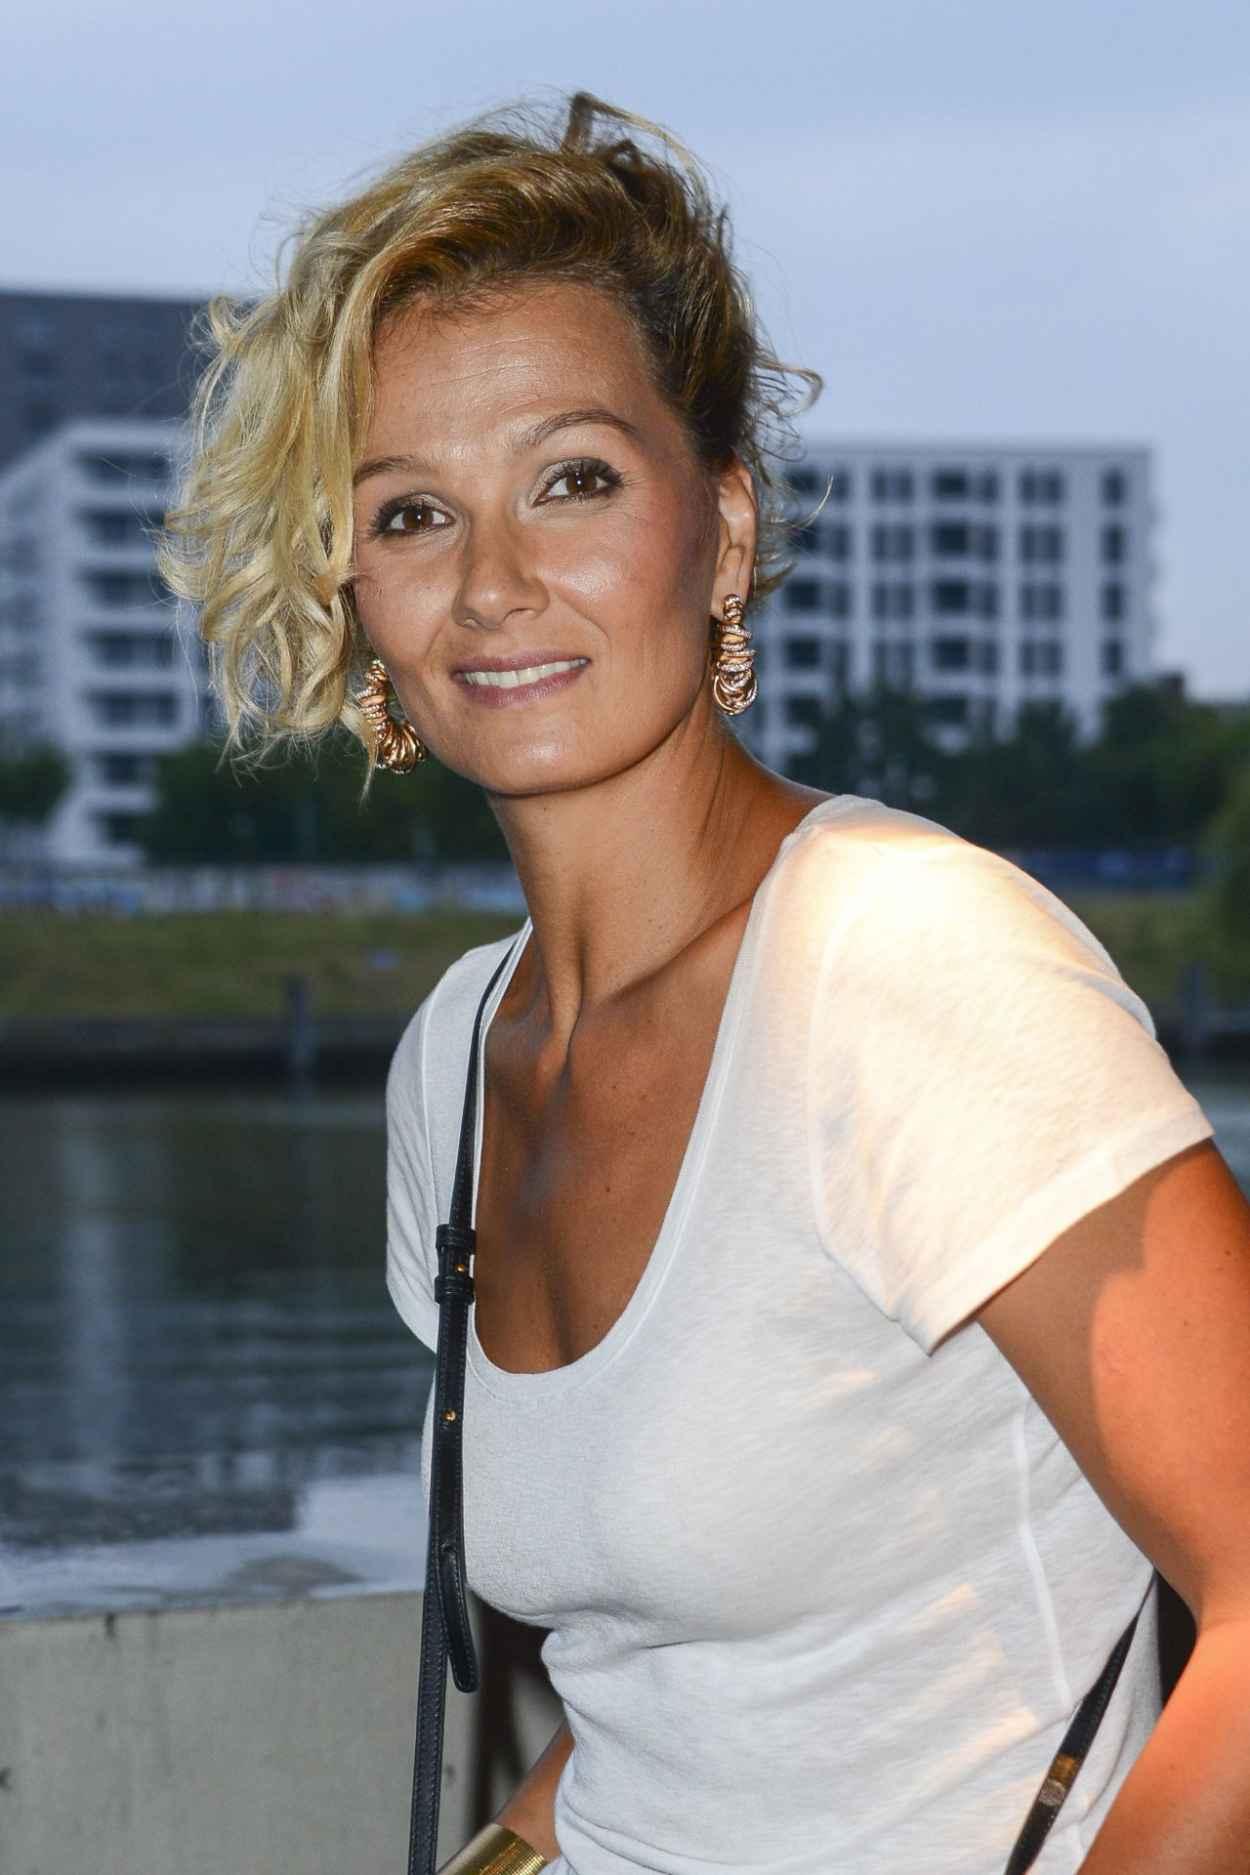 Franziska van Almsick - Mercedes-Benz Fashion Week in Berlin - July 2015-1